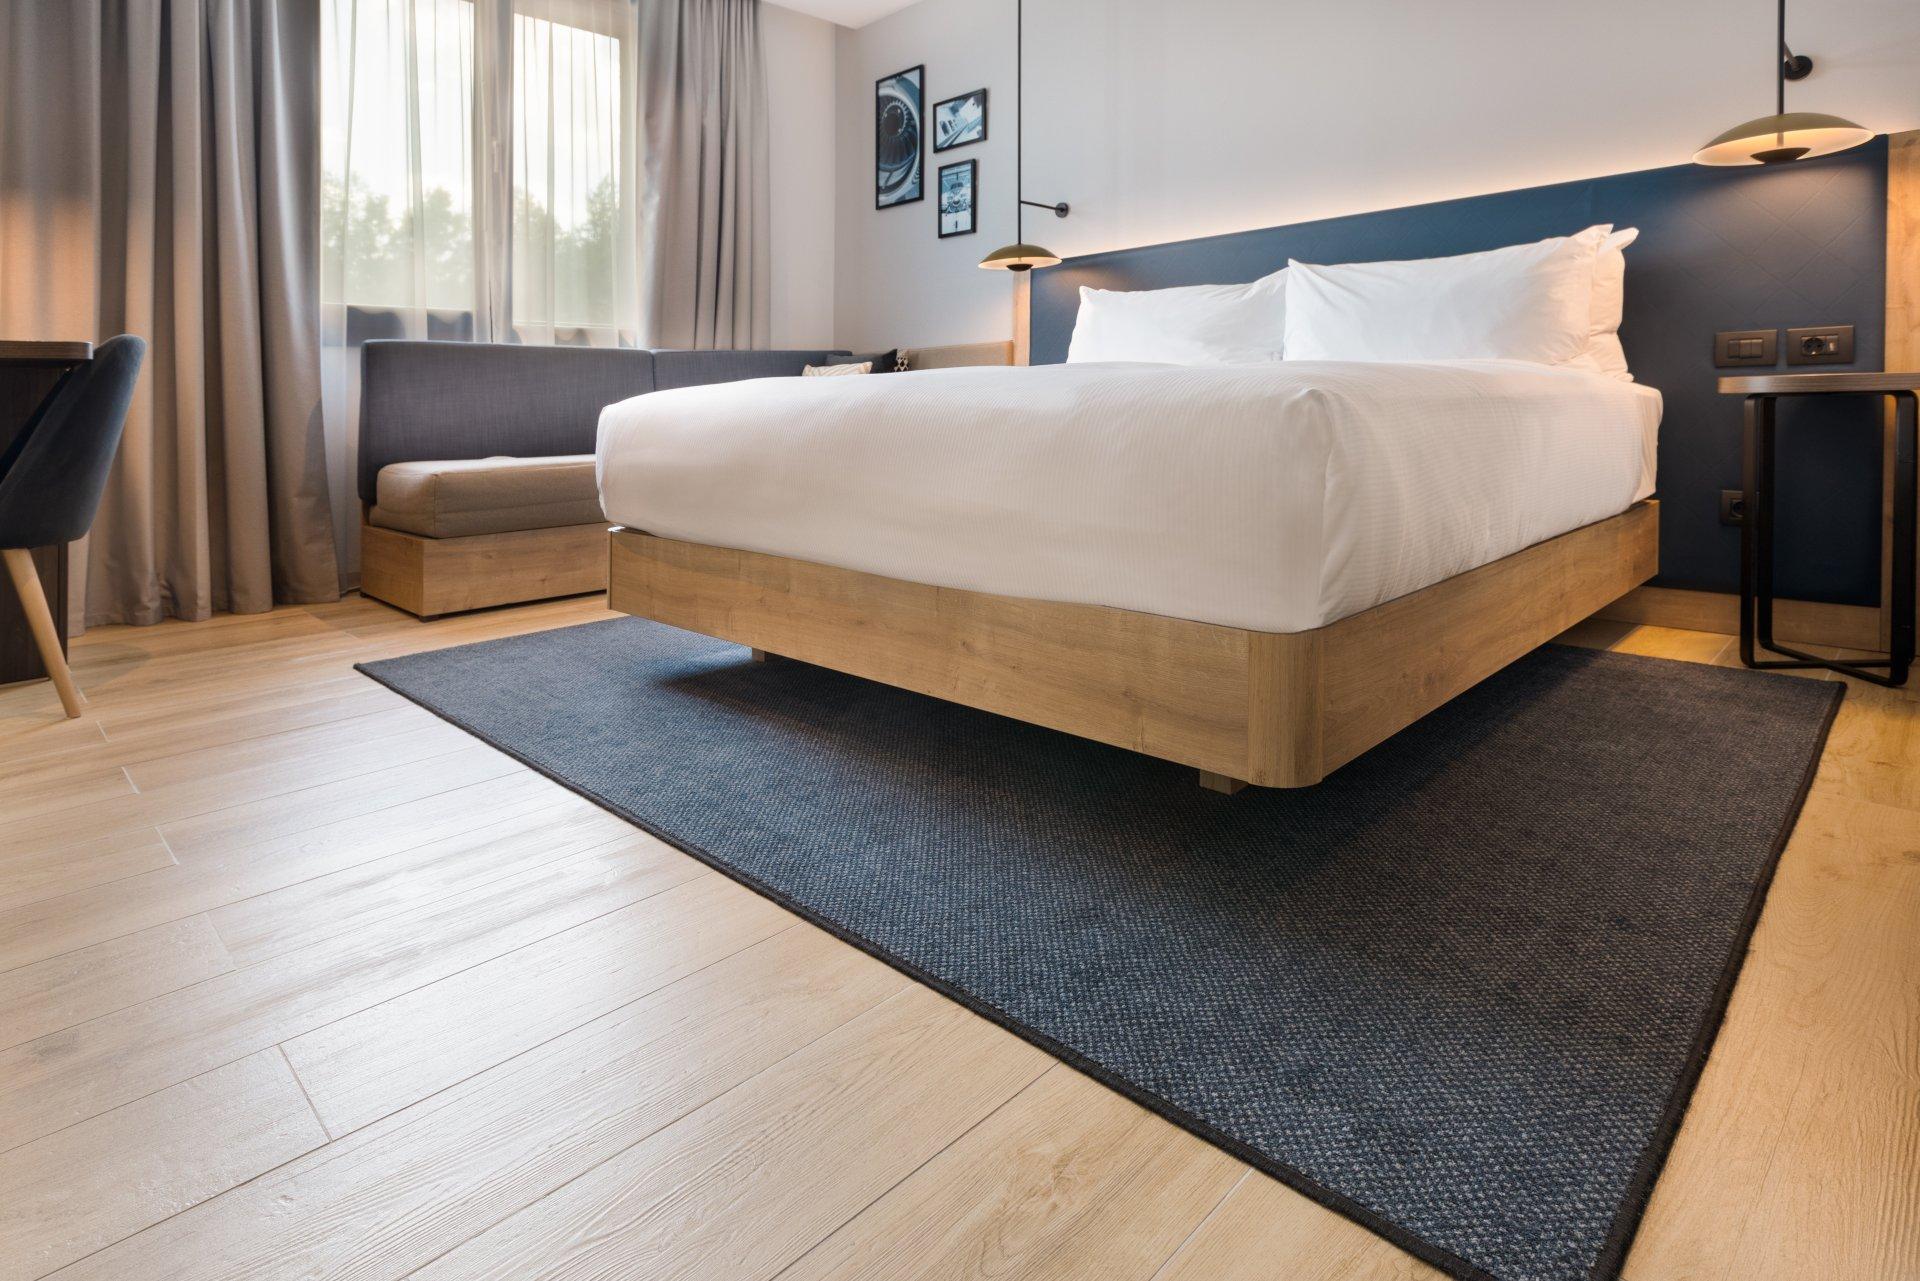 20200625-carpet-and-more-hilton-otopeni-01-PRINCIPALA